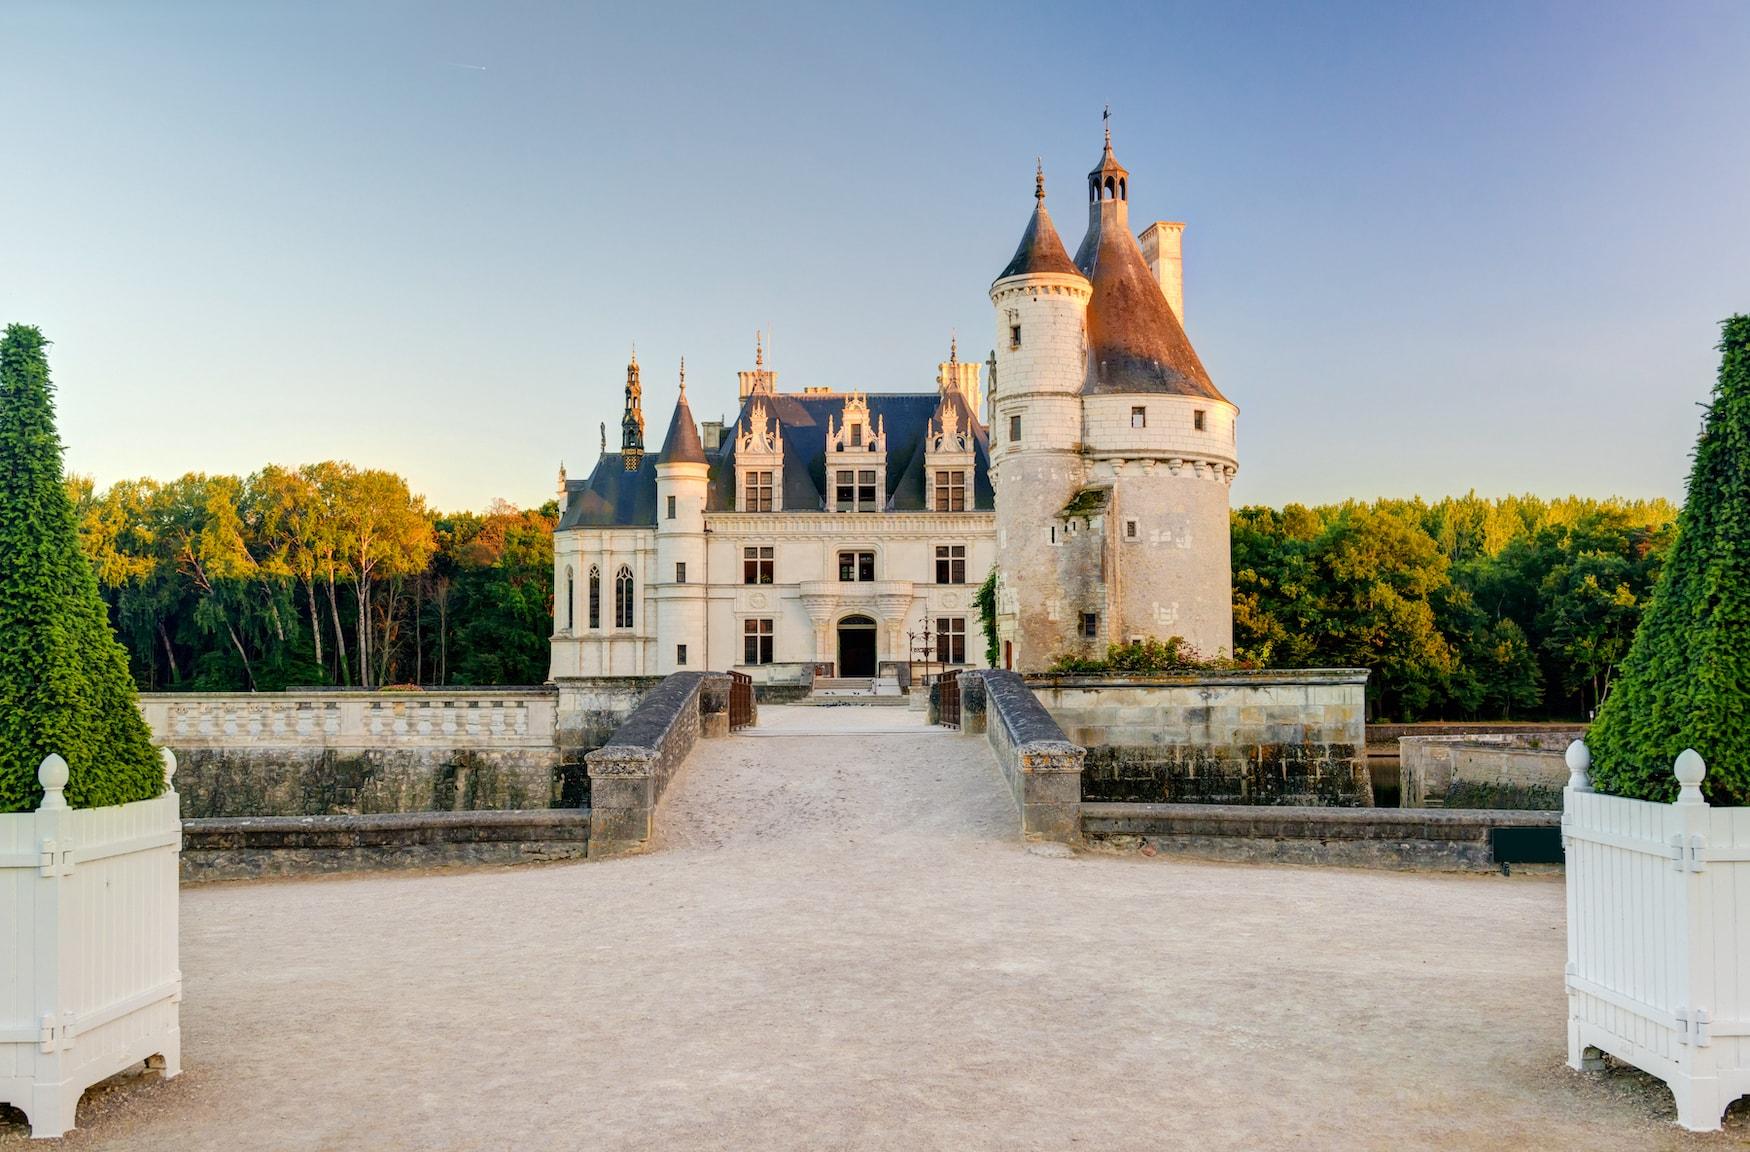 Eingang des Wasserschlosses Chenonceau im Loiretal in Frankreich